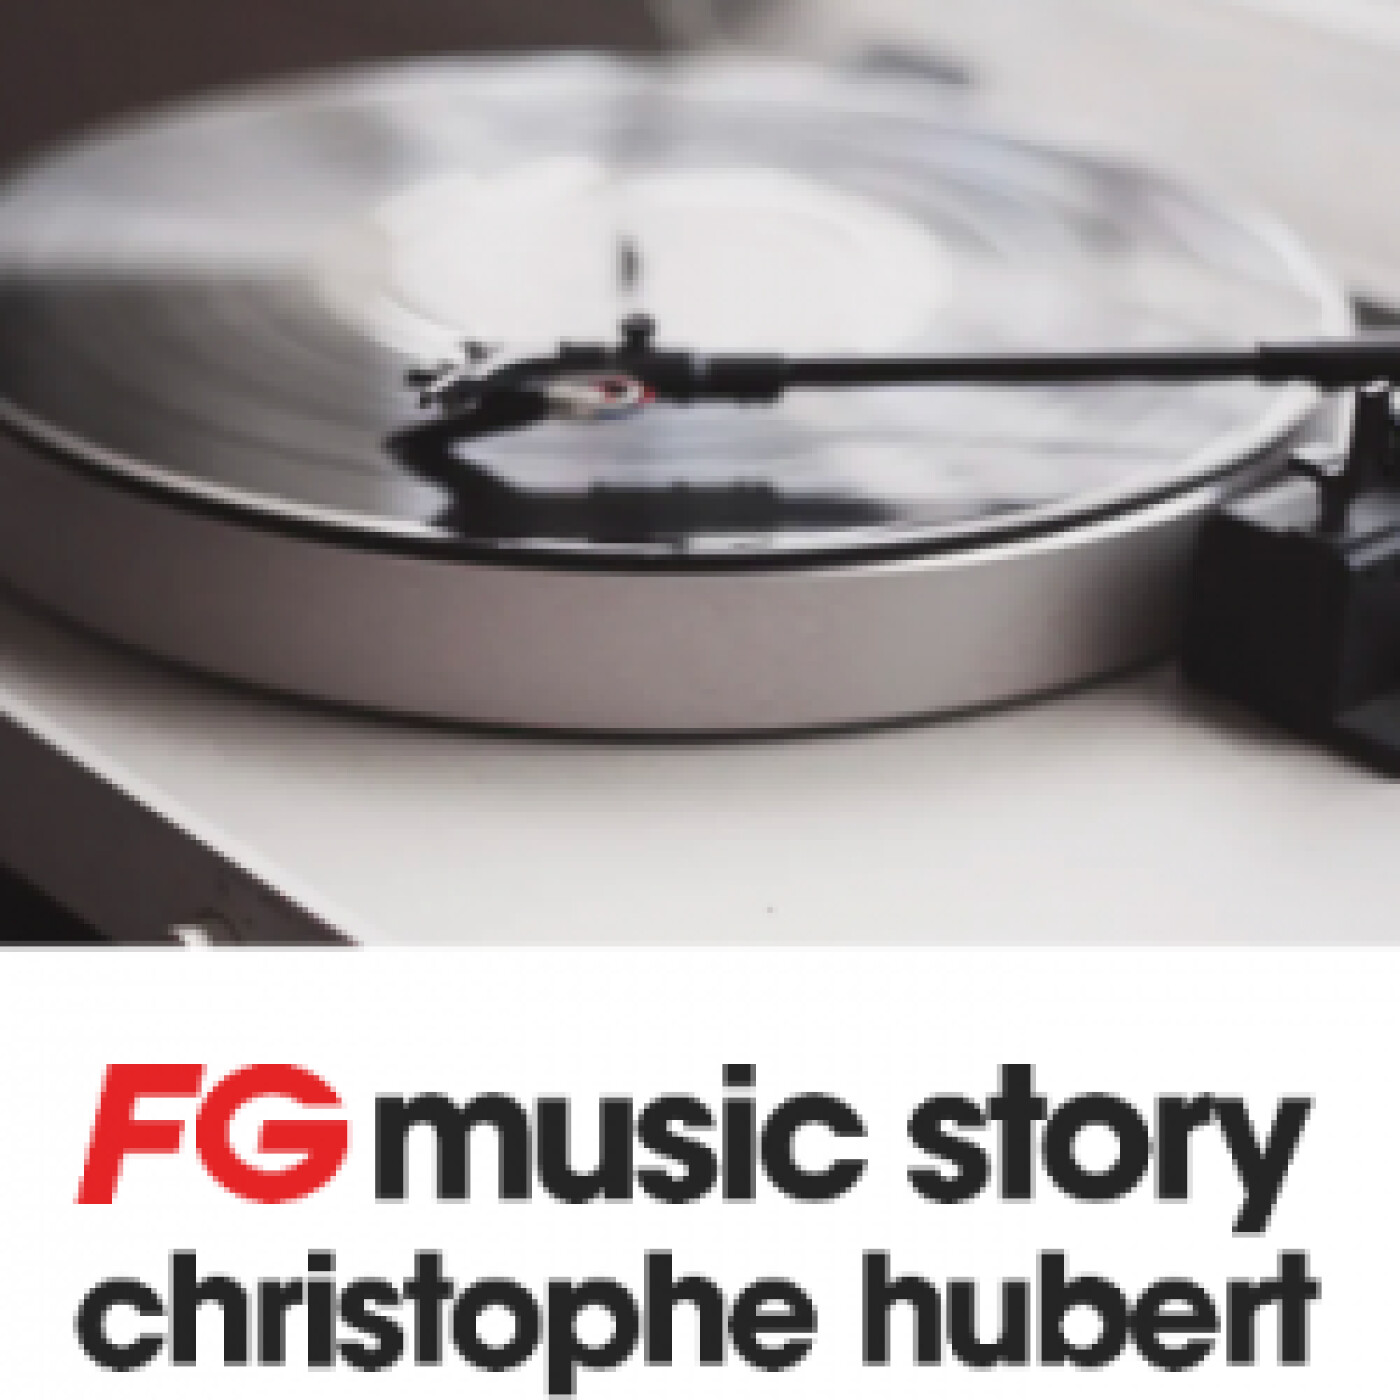 FG MUSIC STORY : JOEL CORRY